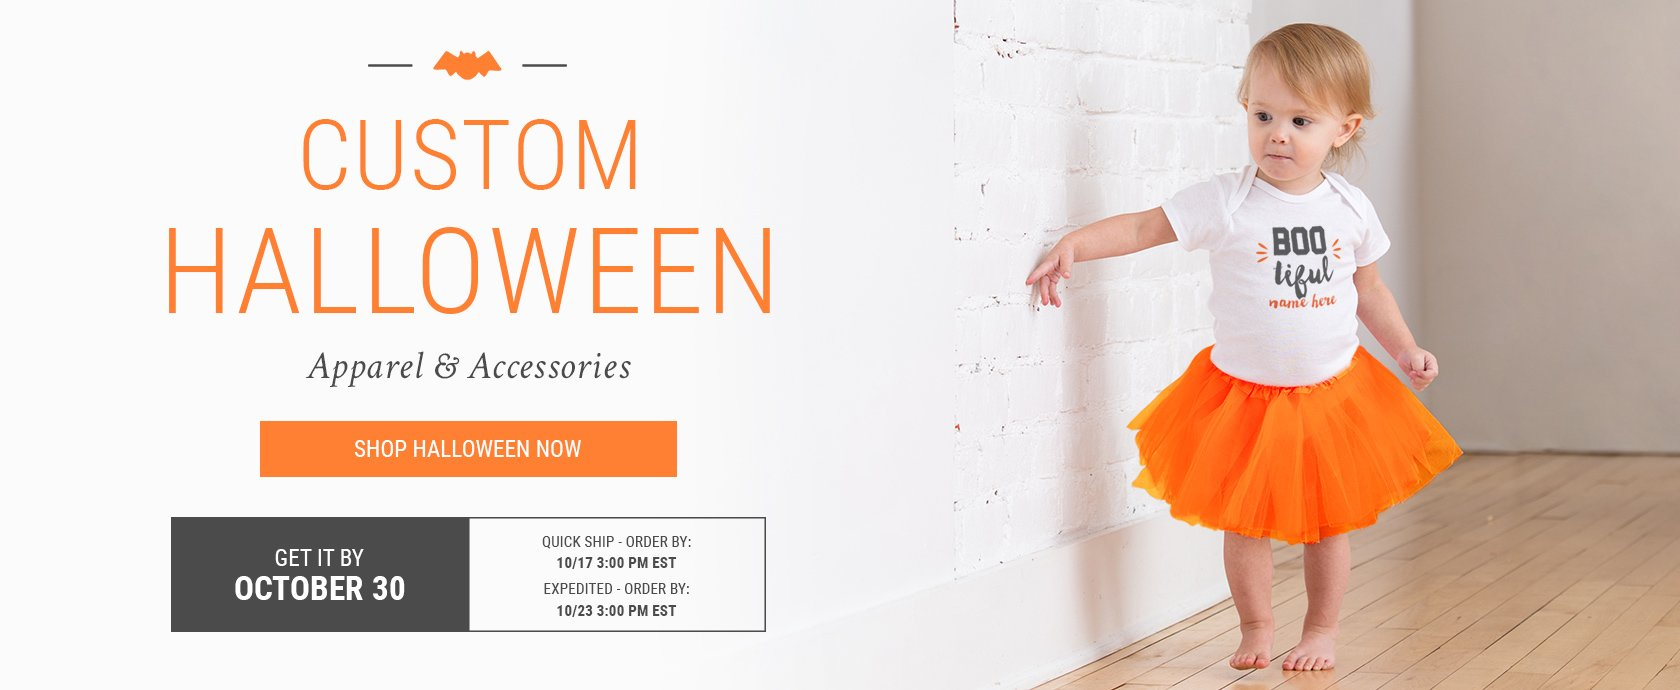 Custom Halloween Apparel & Accessories